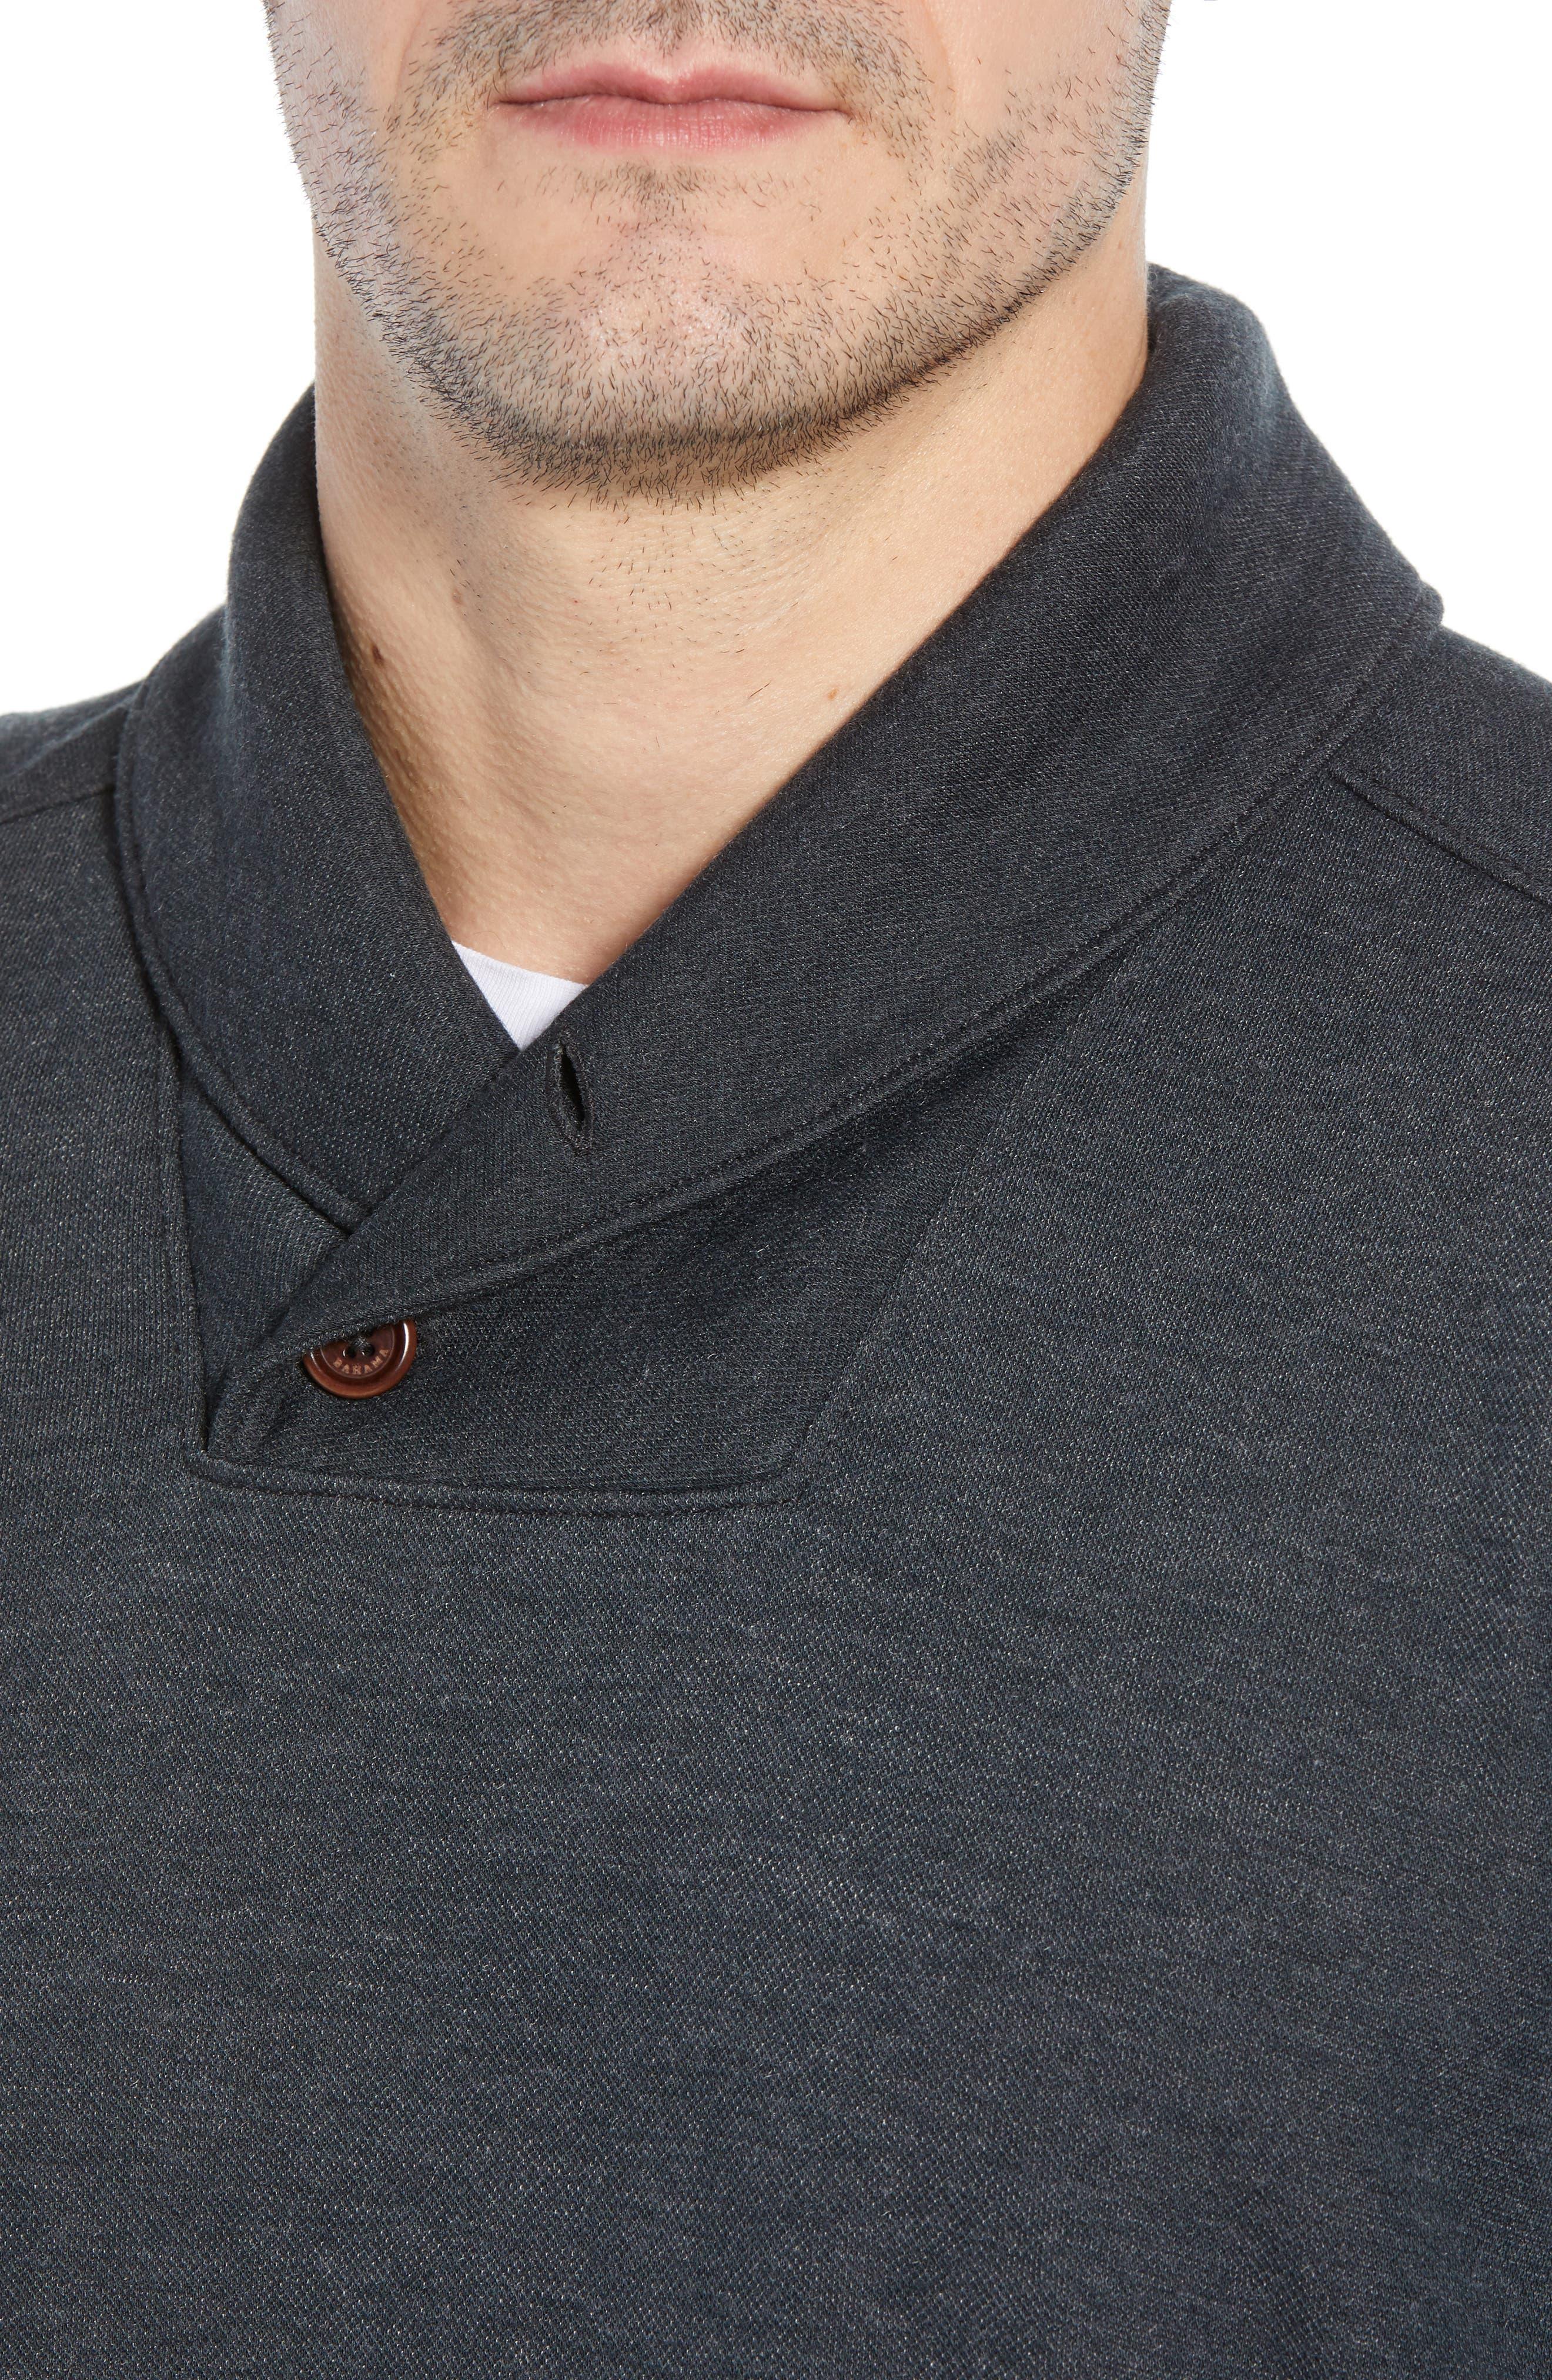 Sandbar Shawl Collar Regular Fit Pullover,                             Alternate thumbnail 4, color,                             COAL